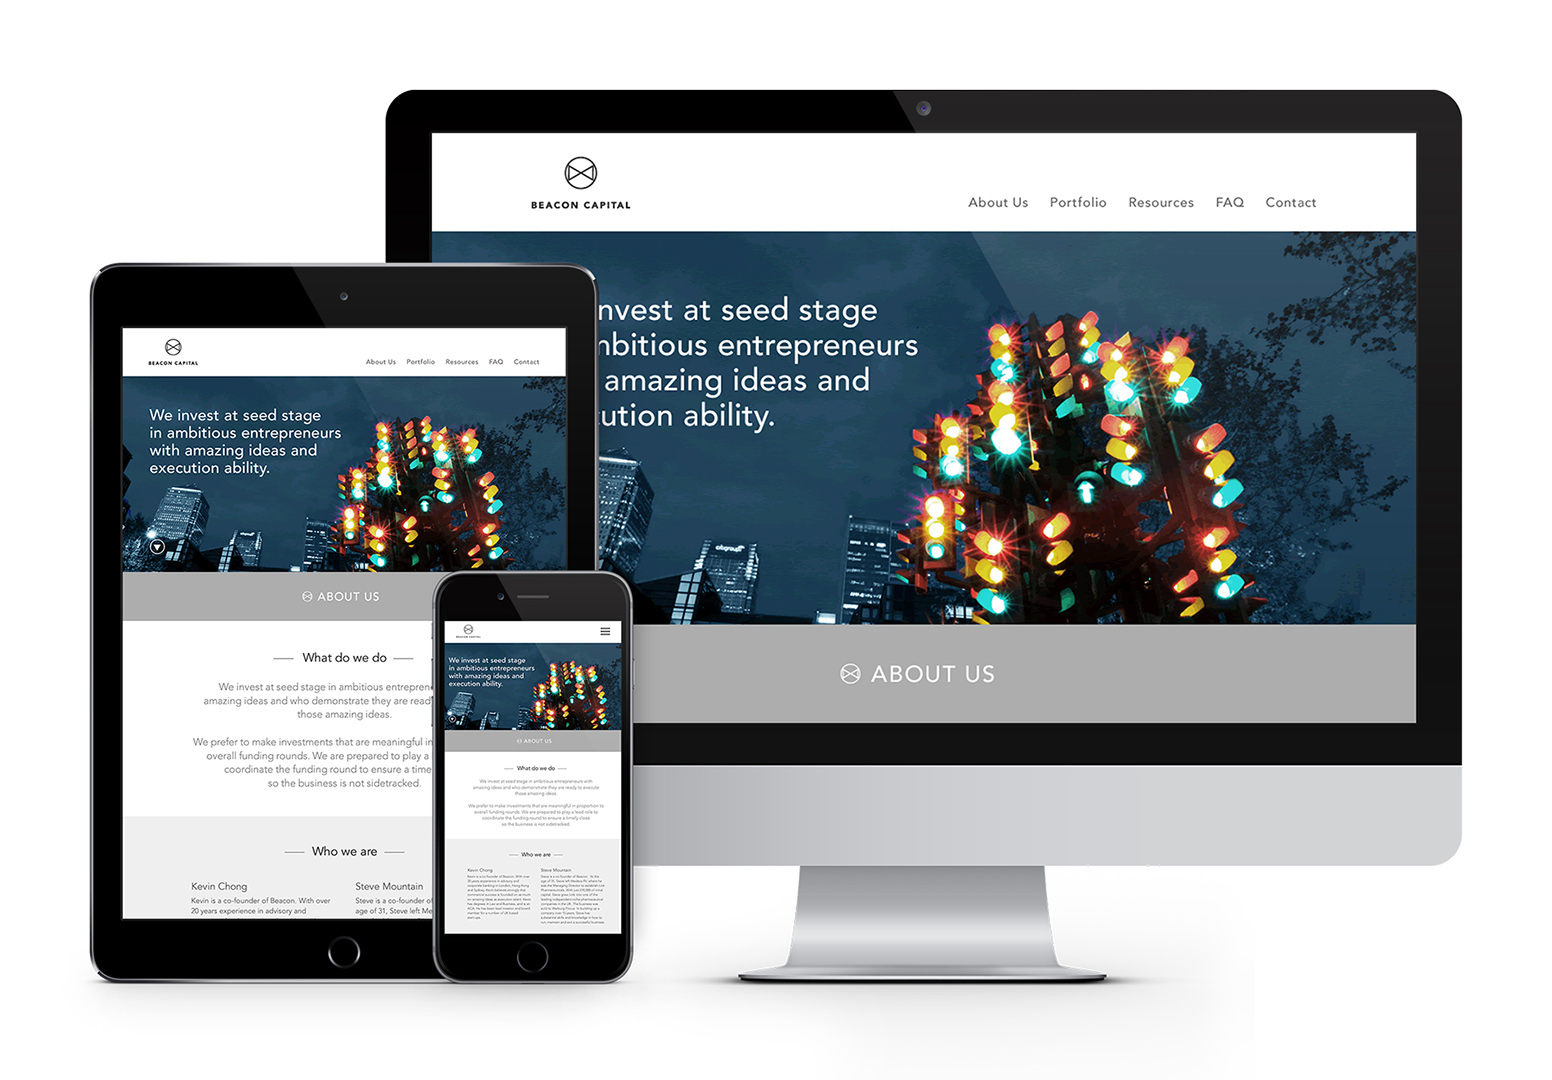 BeaconCapital-DevicePresentation